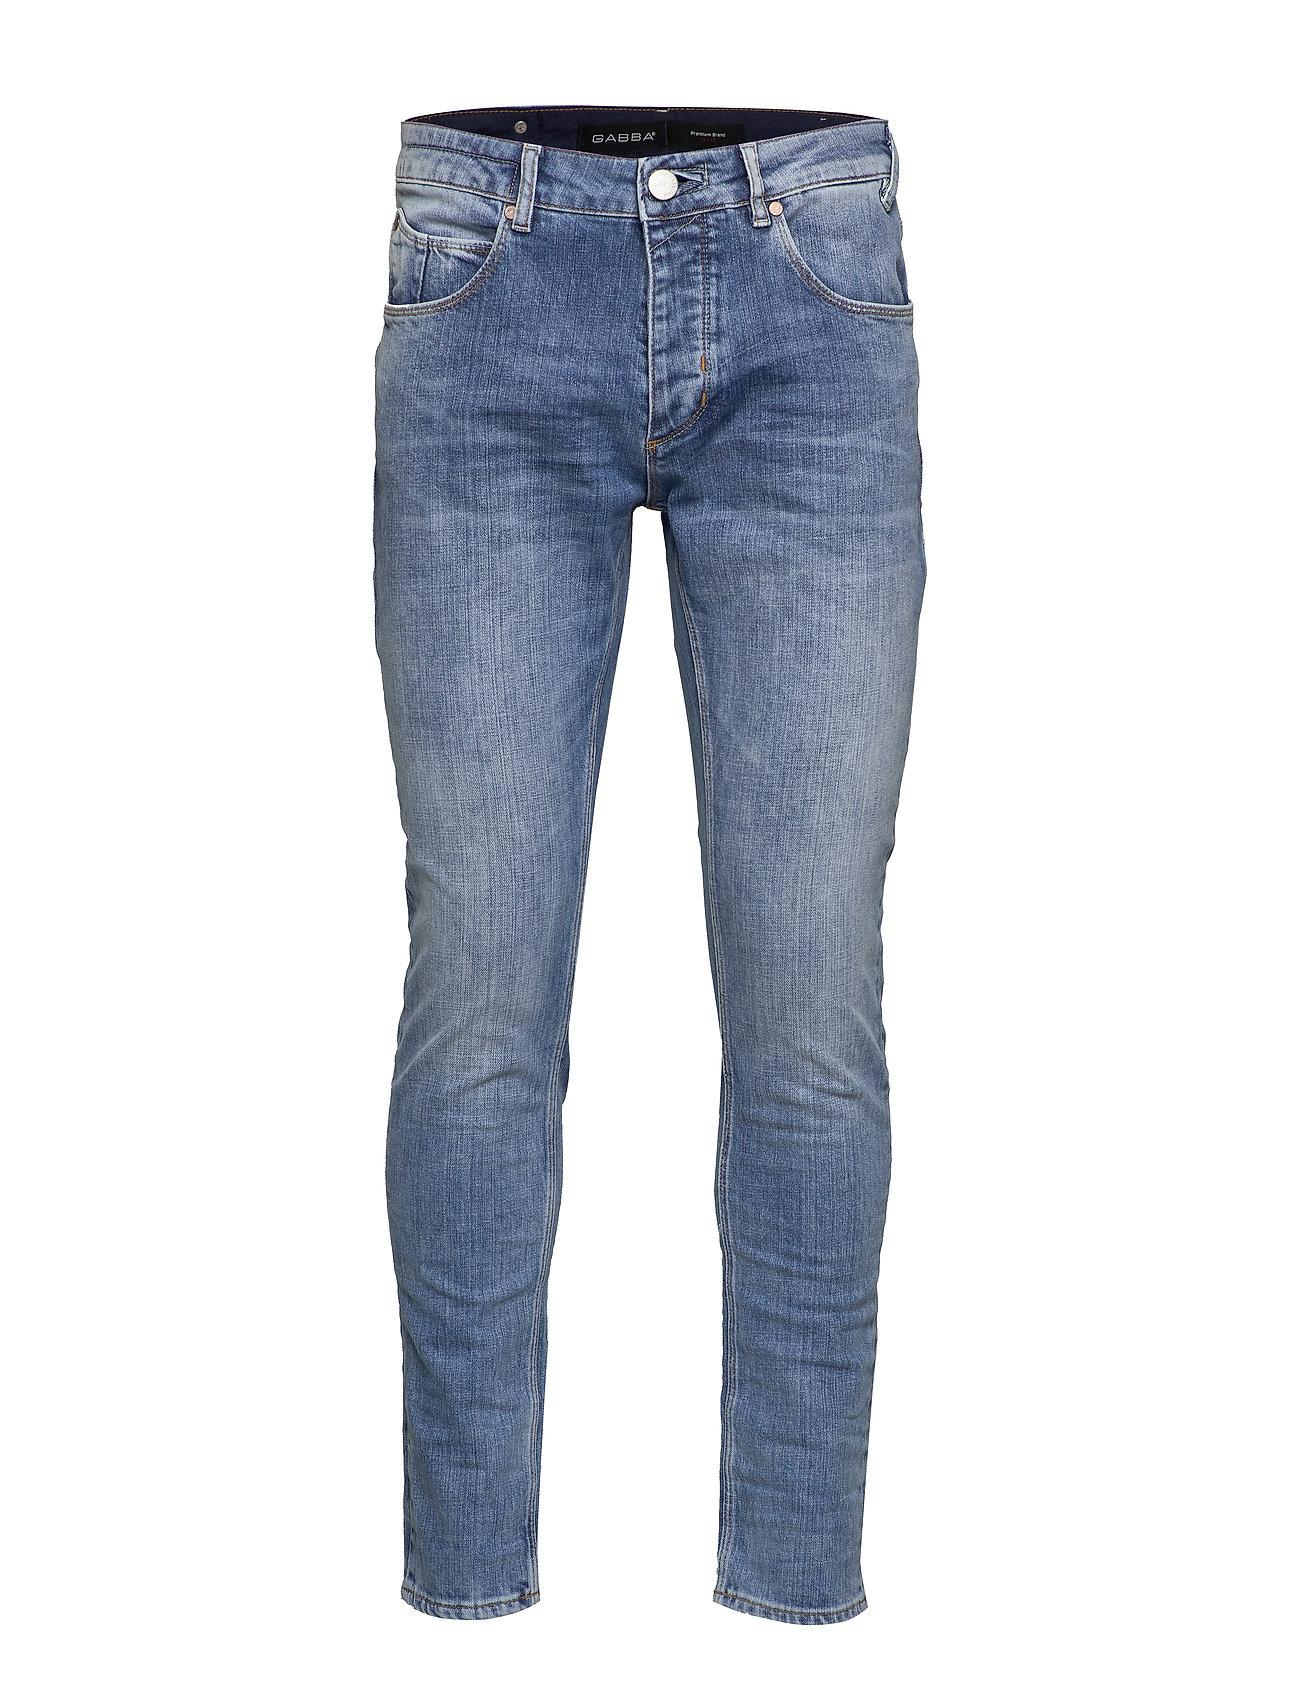 Image of Rey K3145 Slim Jeans Blå Gabba (3558837693)